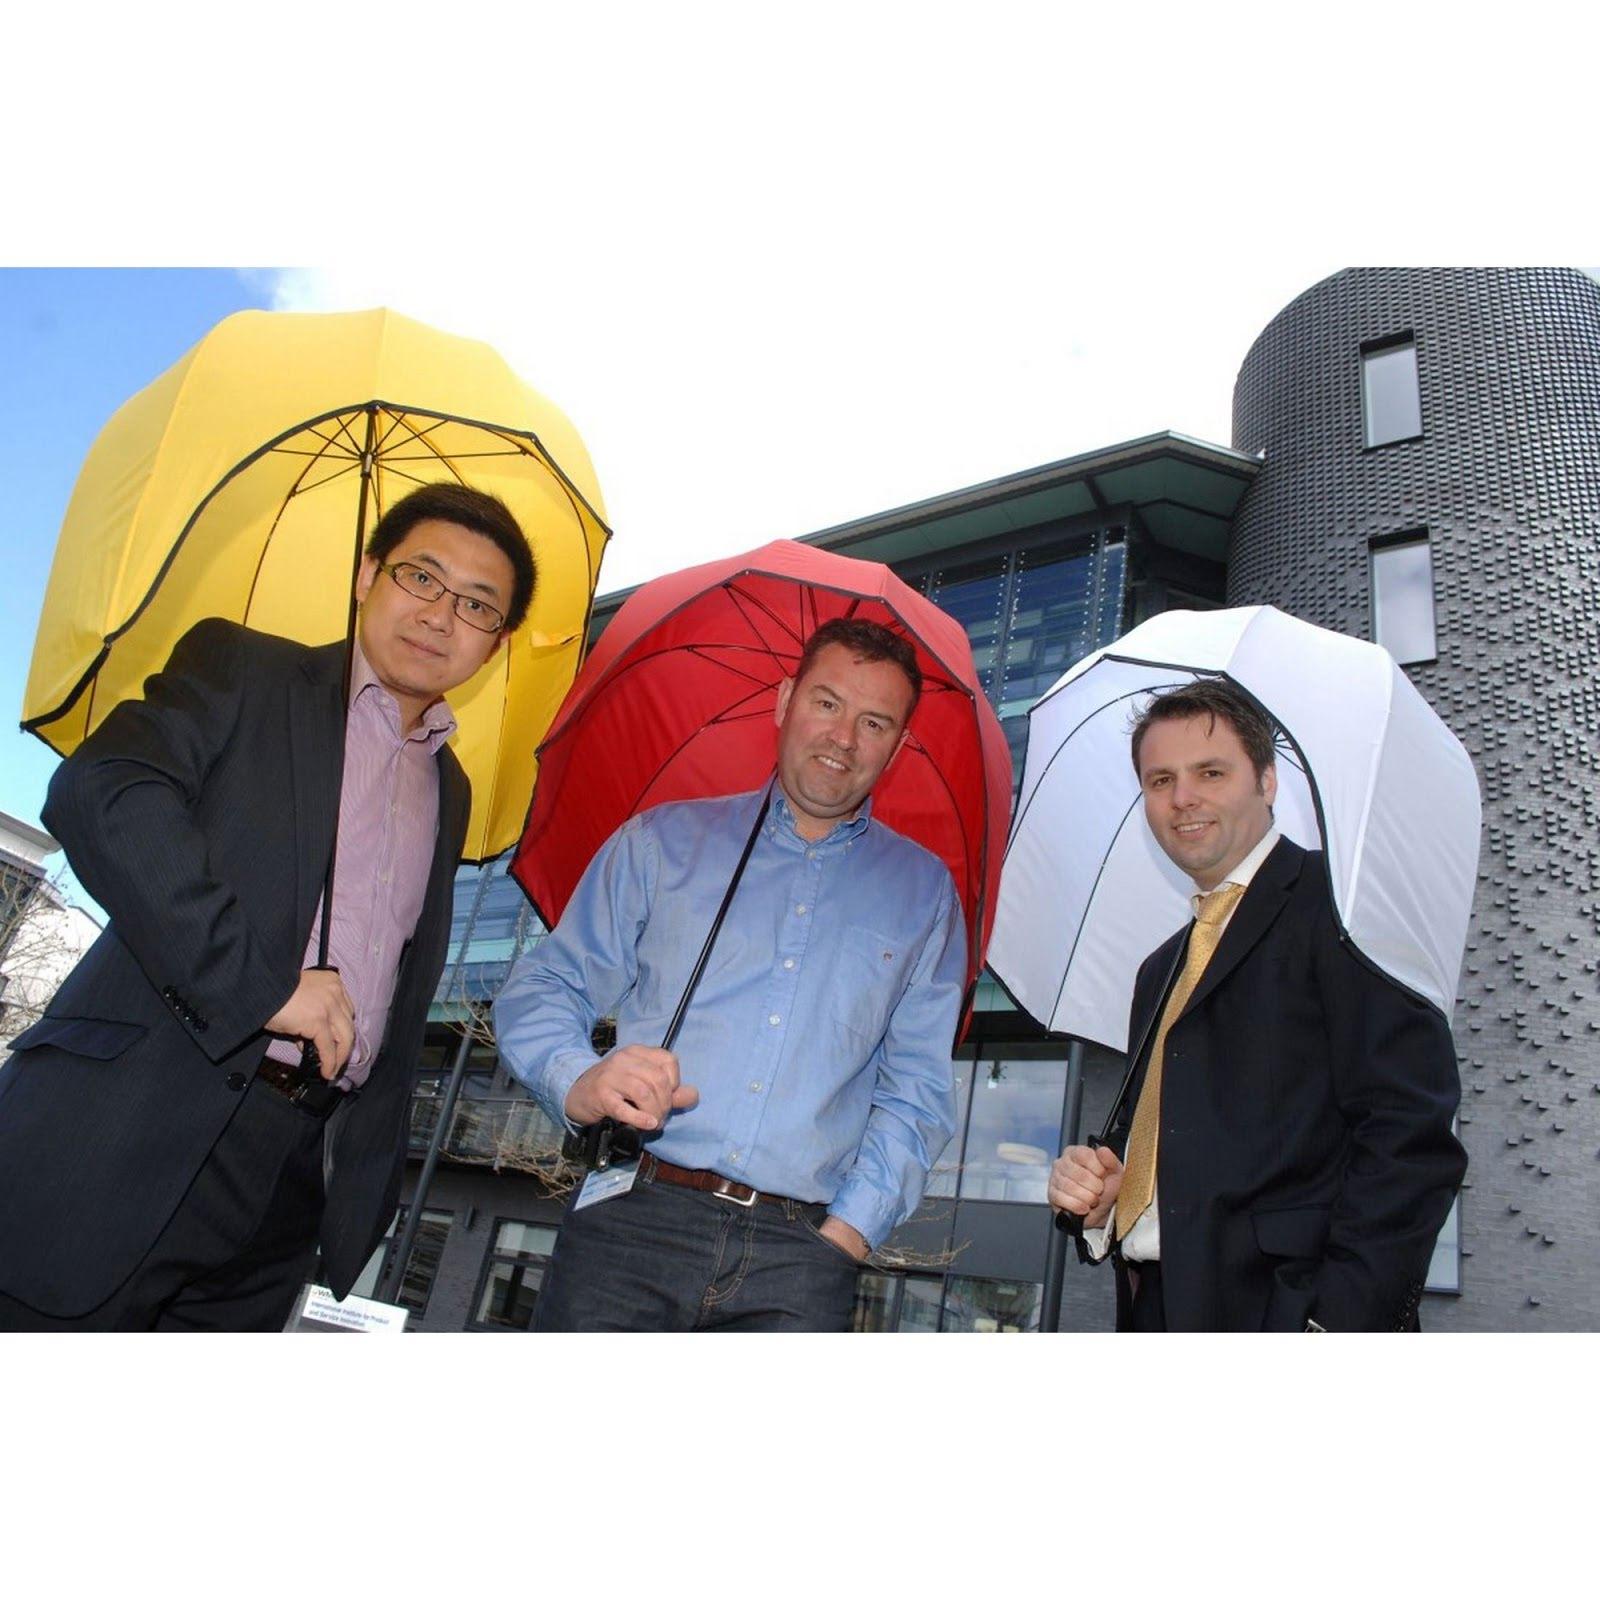 Rainshader Windproof Umbrella